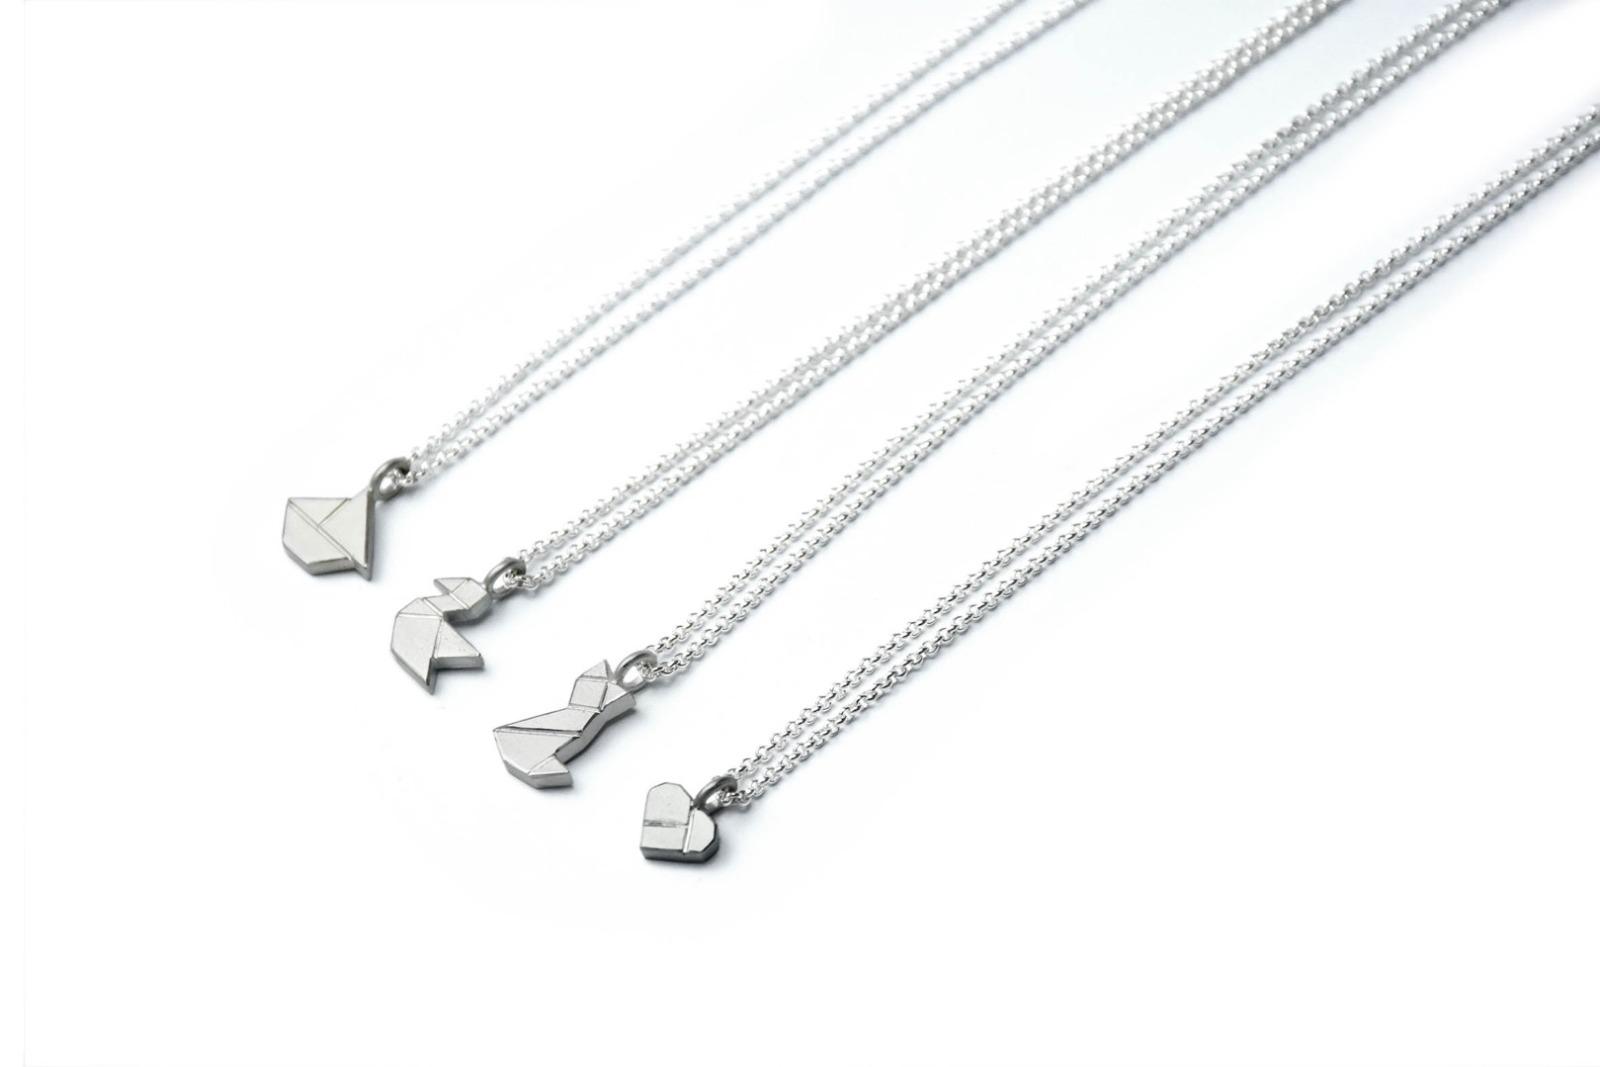 Tangram Kette MIEZE, 935 Silber - 4